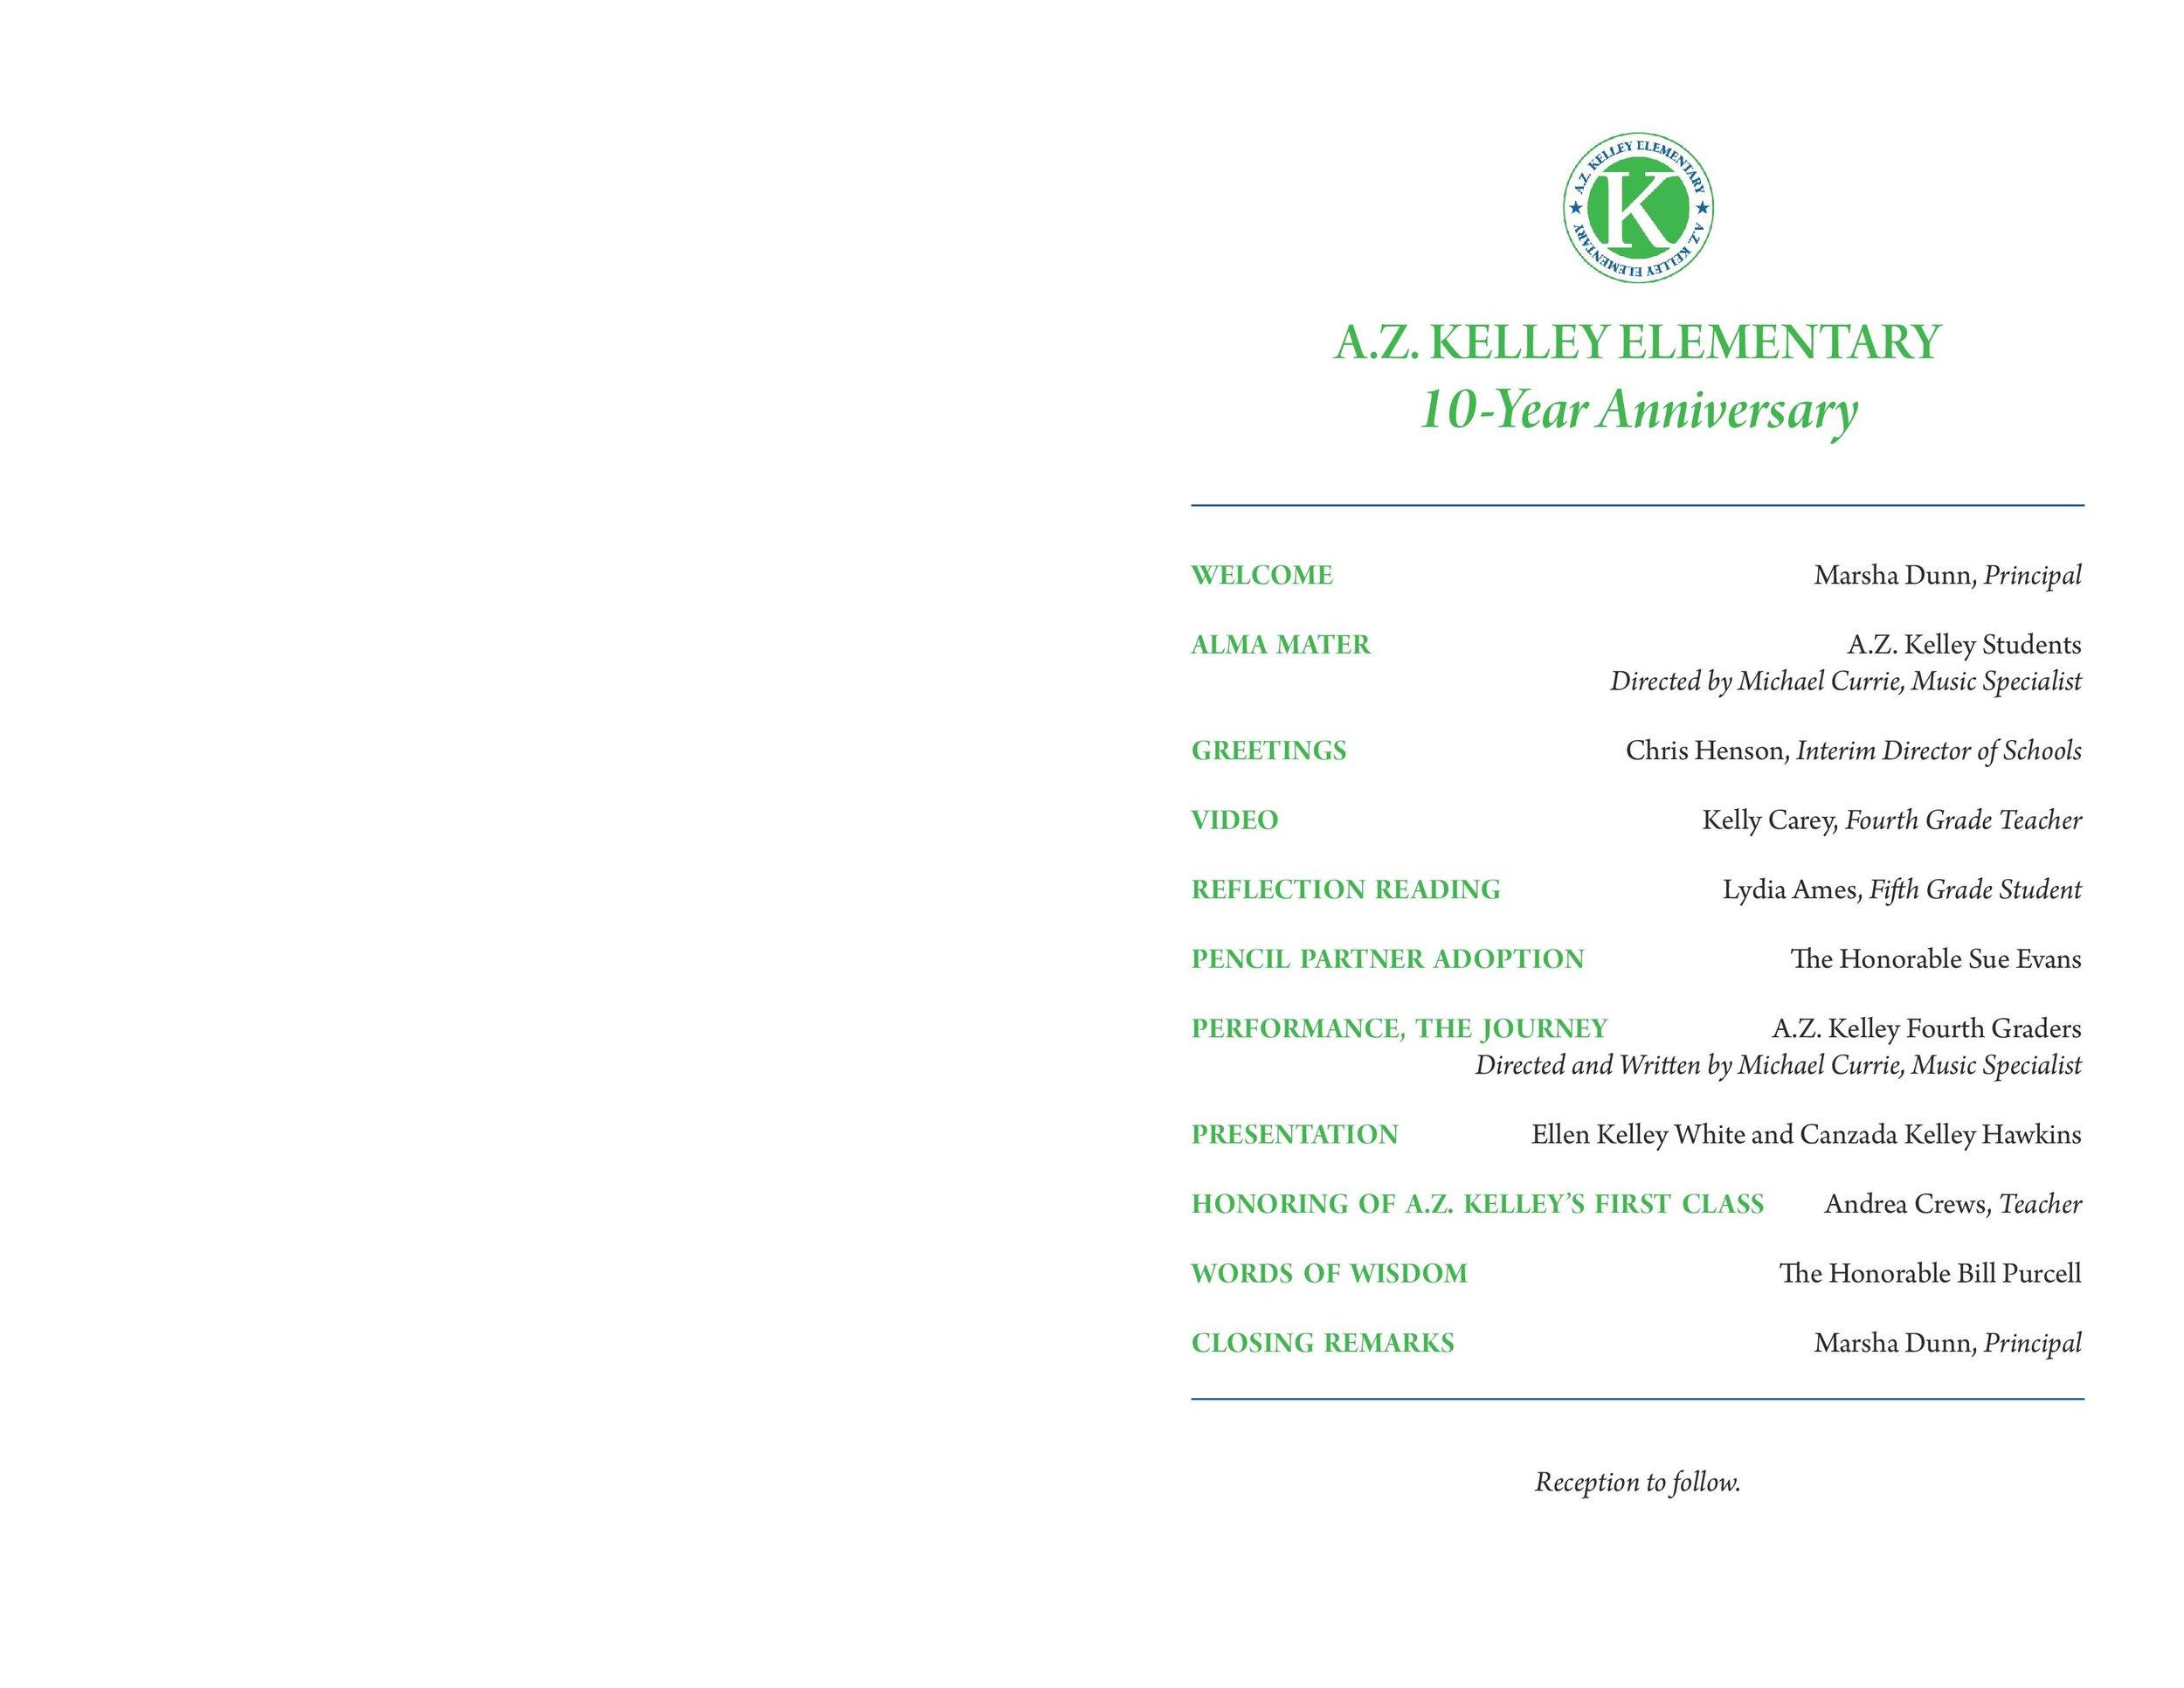 A.Z.-Kelley-Elementary_10-Yr-AnniversaryProgram_12-09-15 (1)-page-002